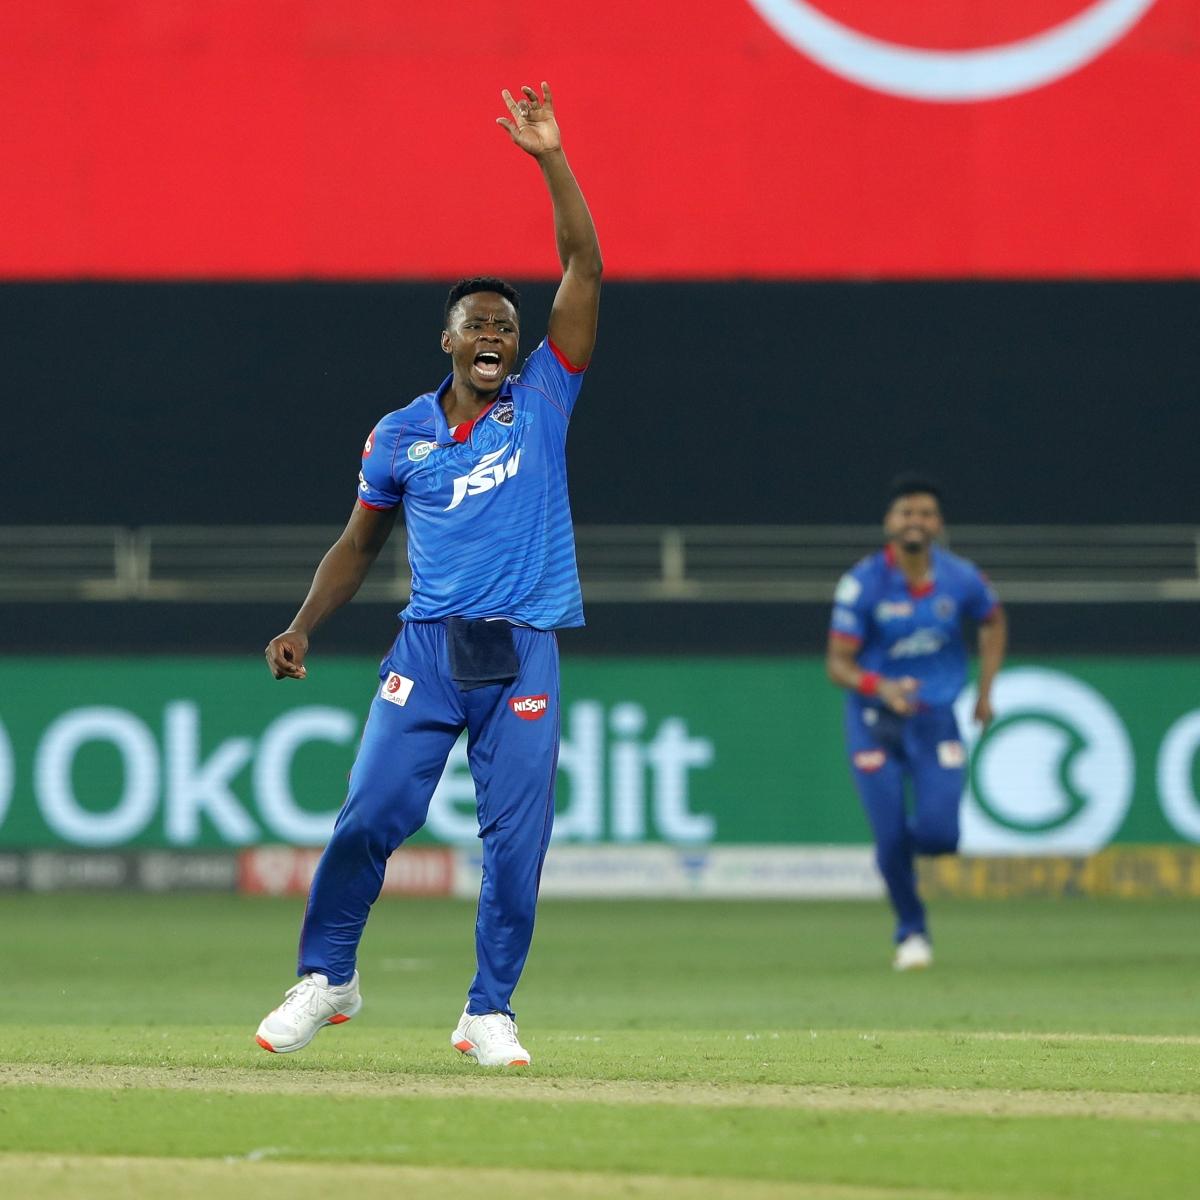 IPL 2020: Rabada and Nortje's execution at death will be key to Delhi Capitals' success, reckons Brad Hogg